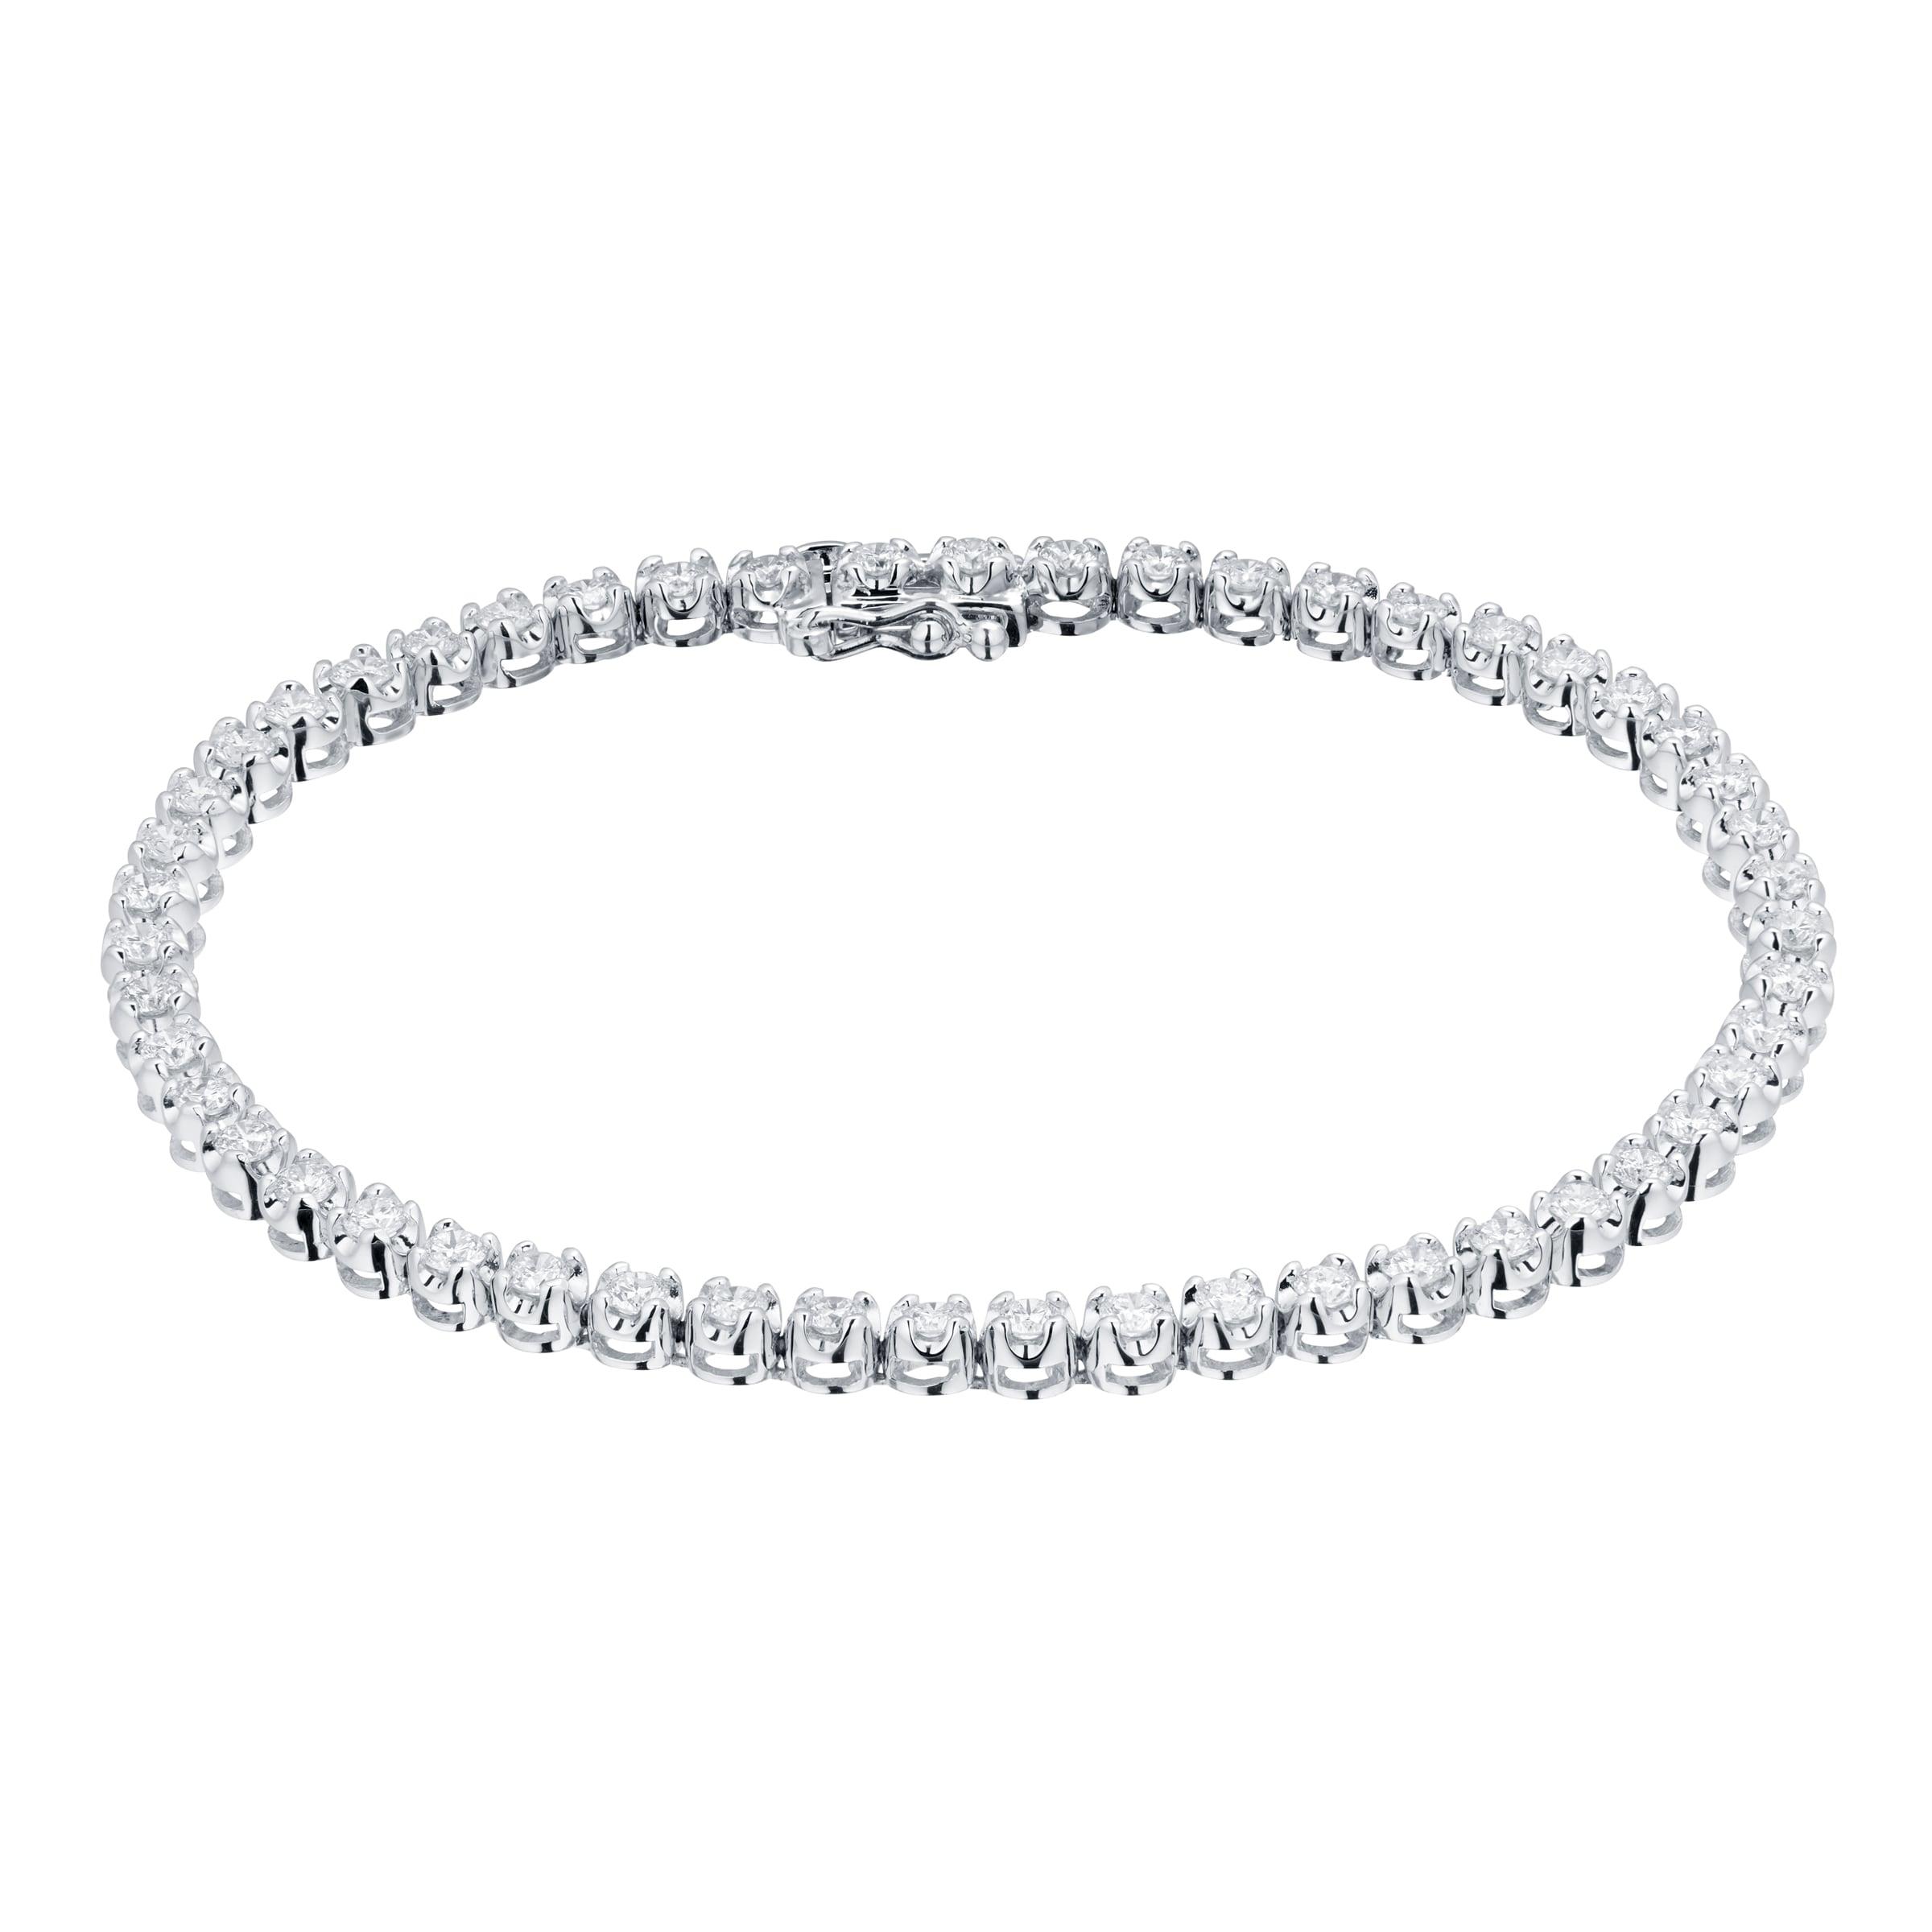 Goldsmiths 9ct White Gold 2.00cttw Diamond Tennis Bracelet